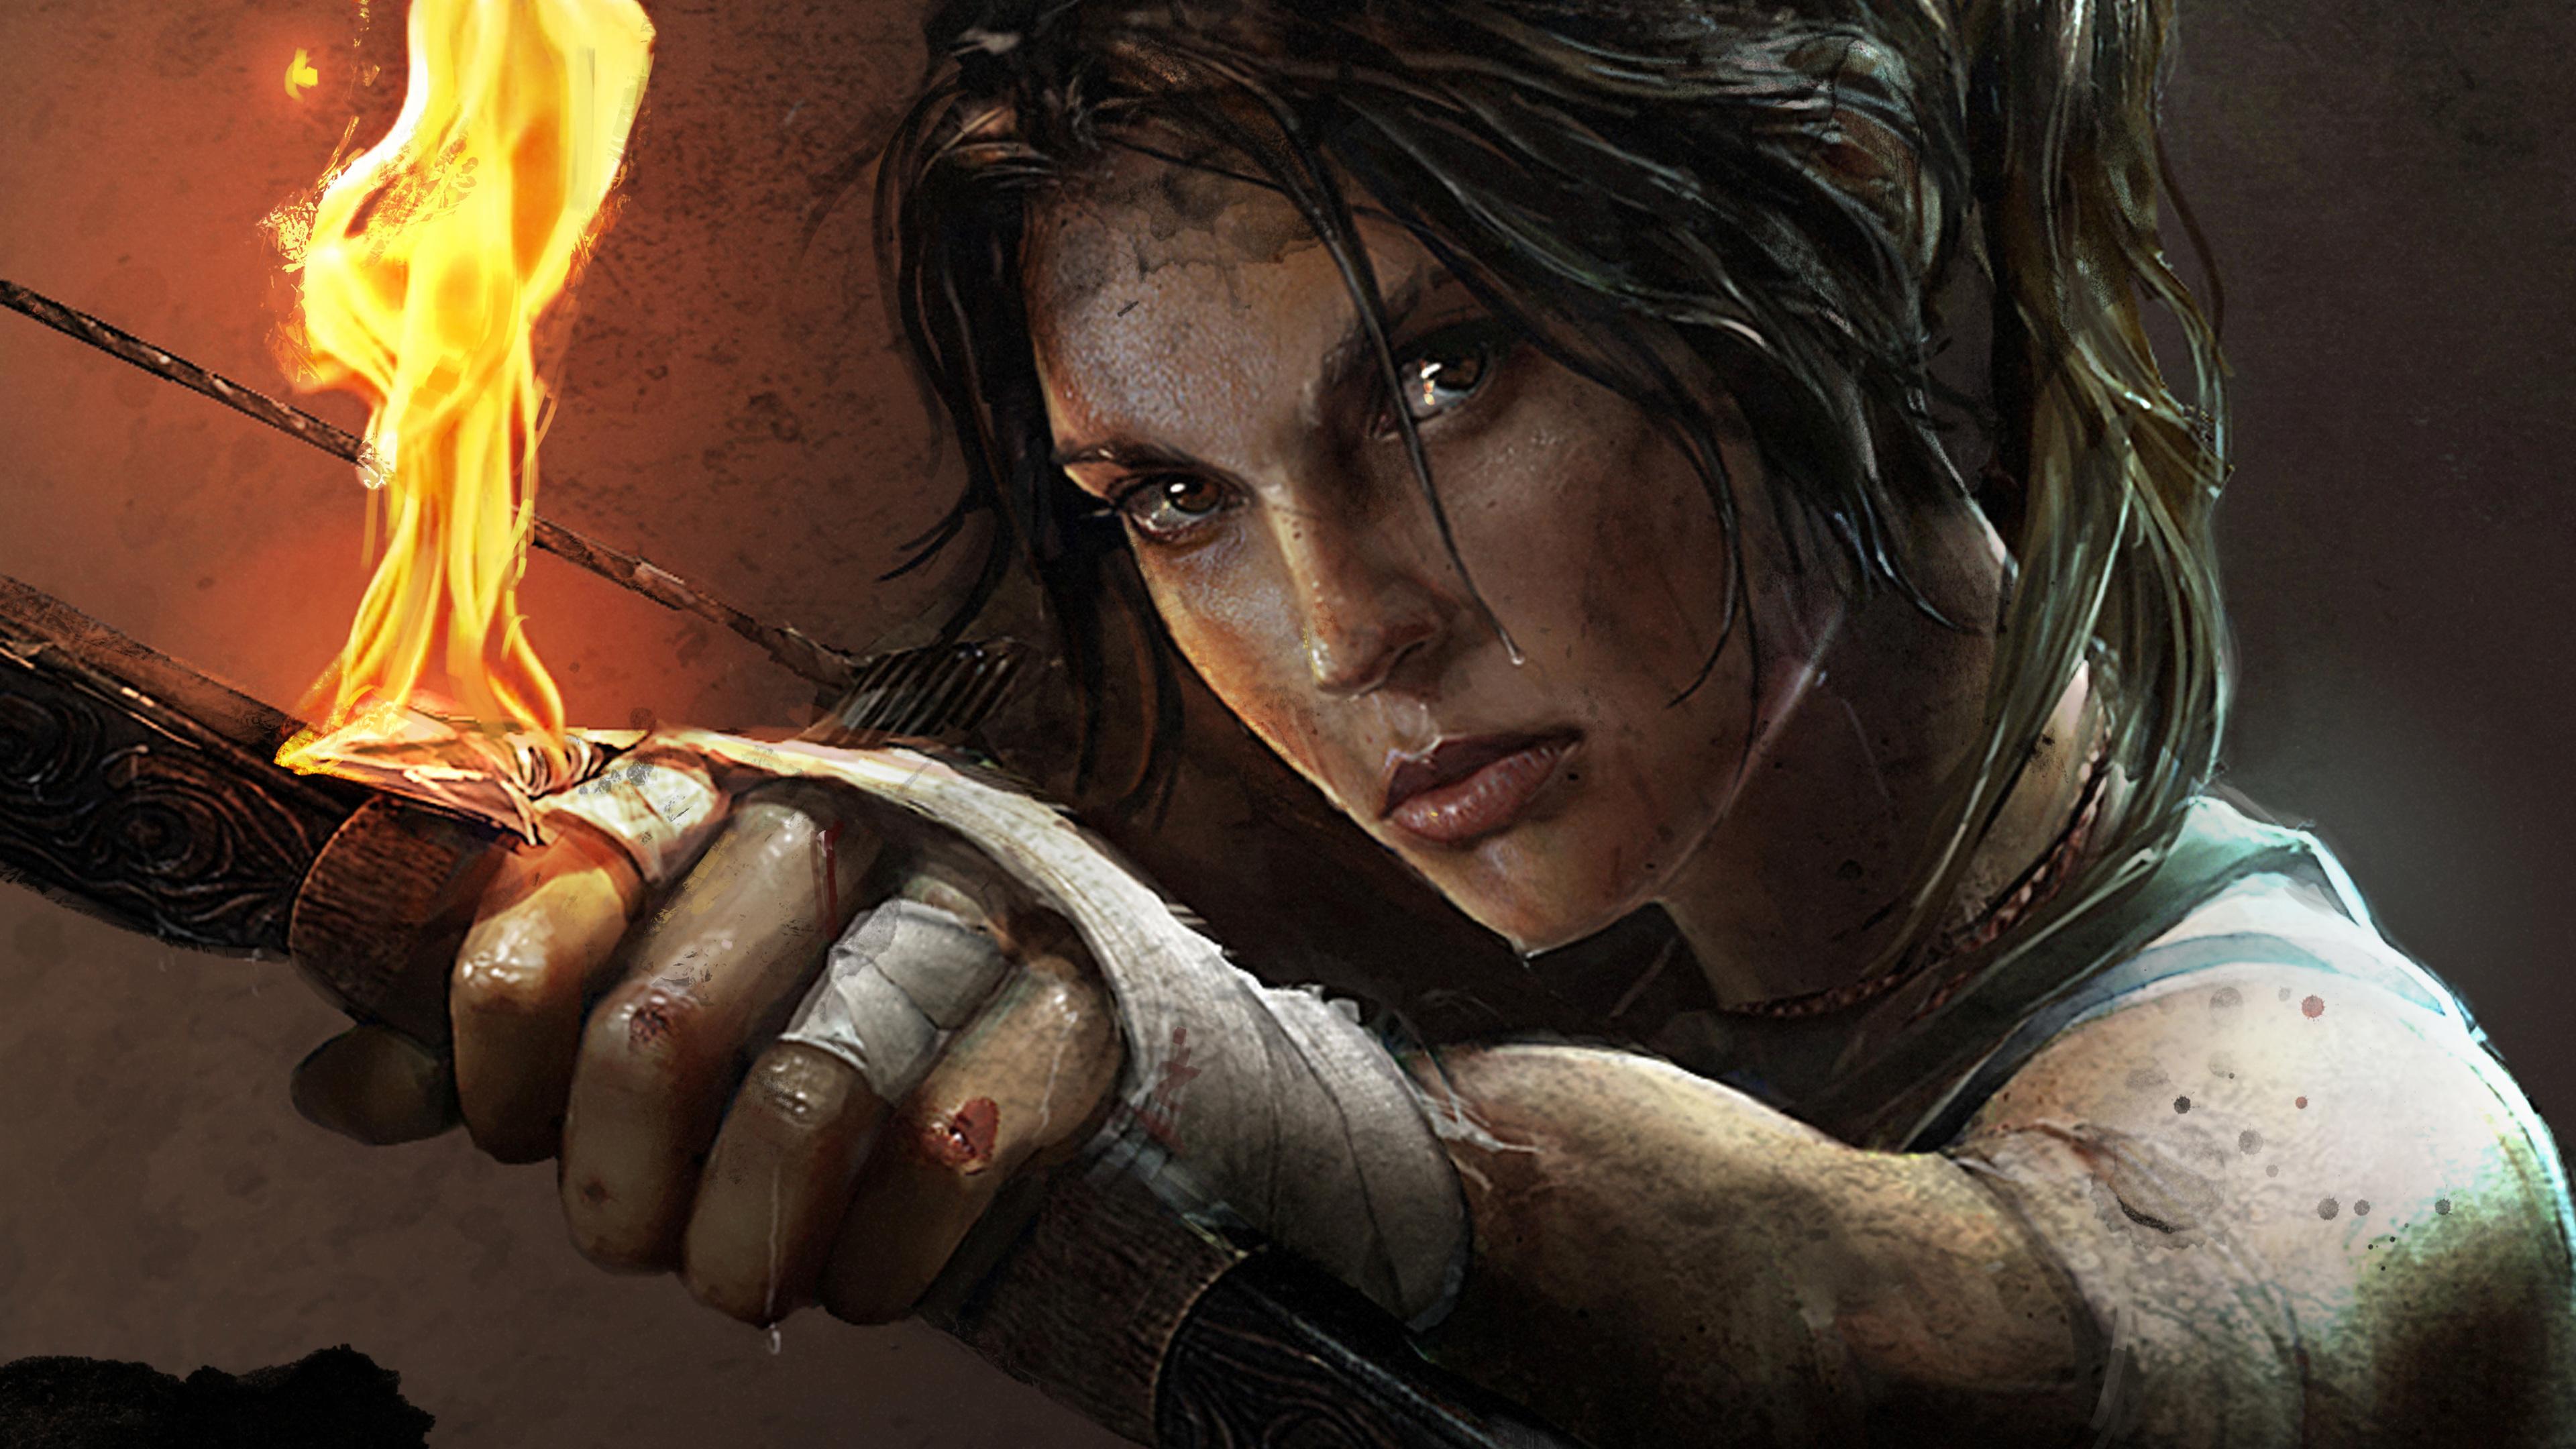 tomb raider lara croft artwork 4k 1537691700 - Tomb Raider Lara Croft Artwork 4k - xbox games wallpapers, tomb raider wallpapers, ps games wallpapers, pc games wallpapers, hd-wallpapers, games wallpapers, 4k-wallpapers